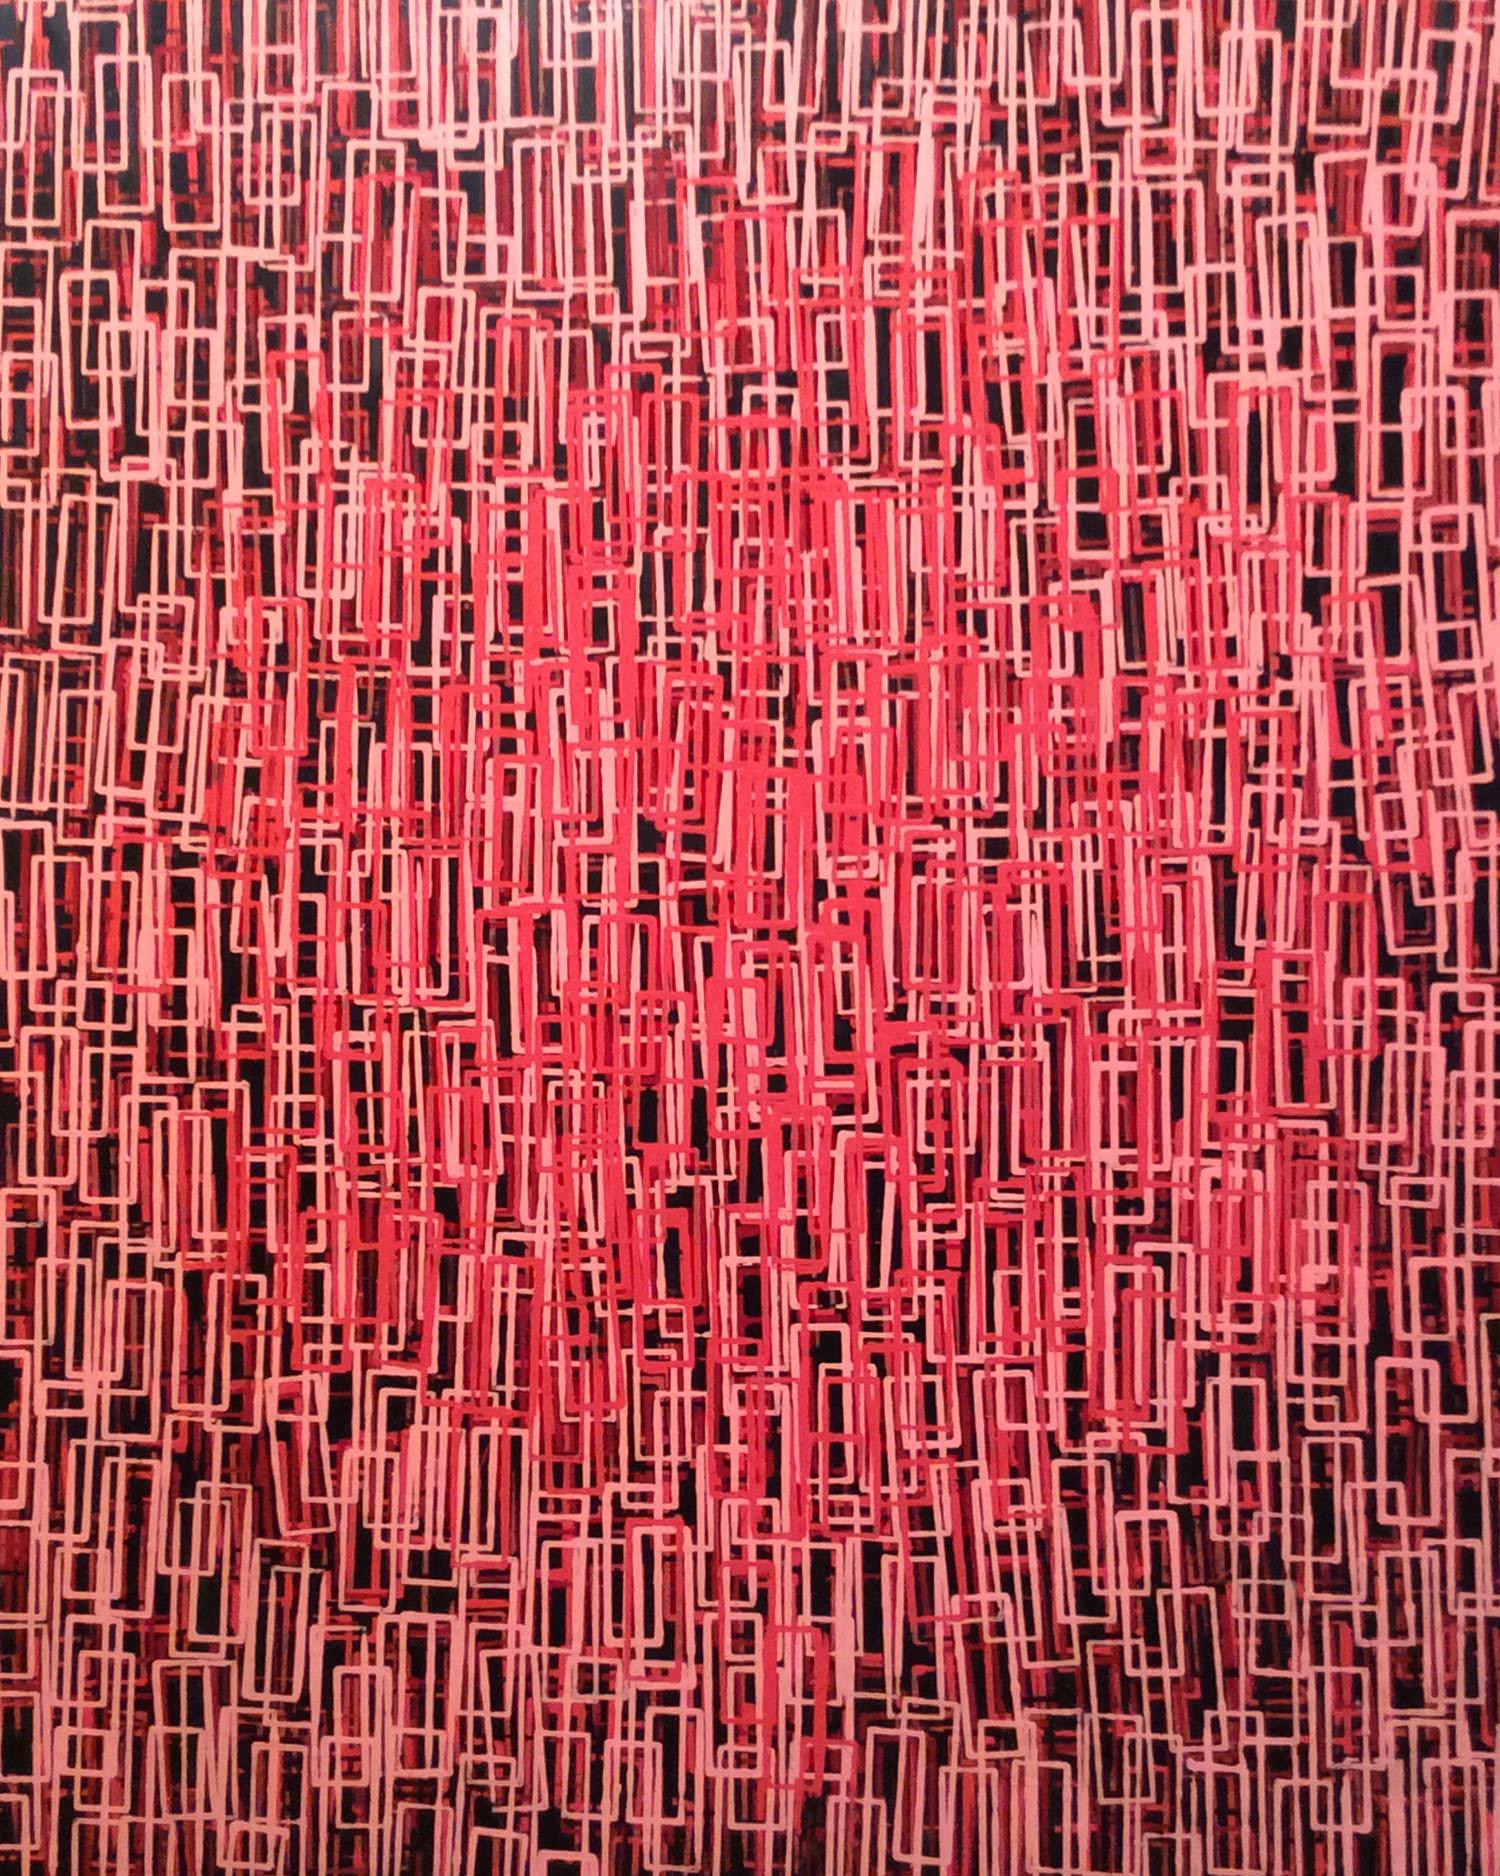 Josep Navarro Vives. Composición óptica-cinètica. 1975, oli sobre tela, cm 150 x 150.